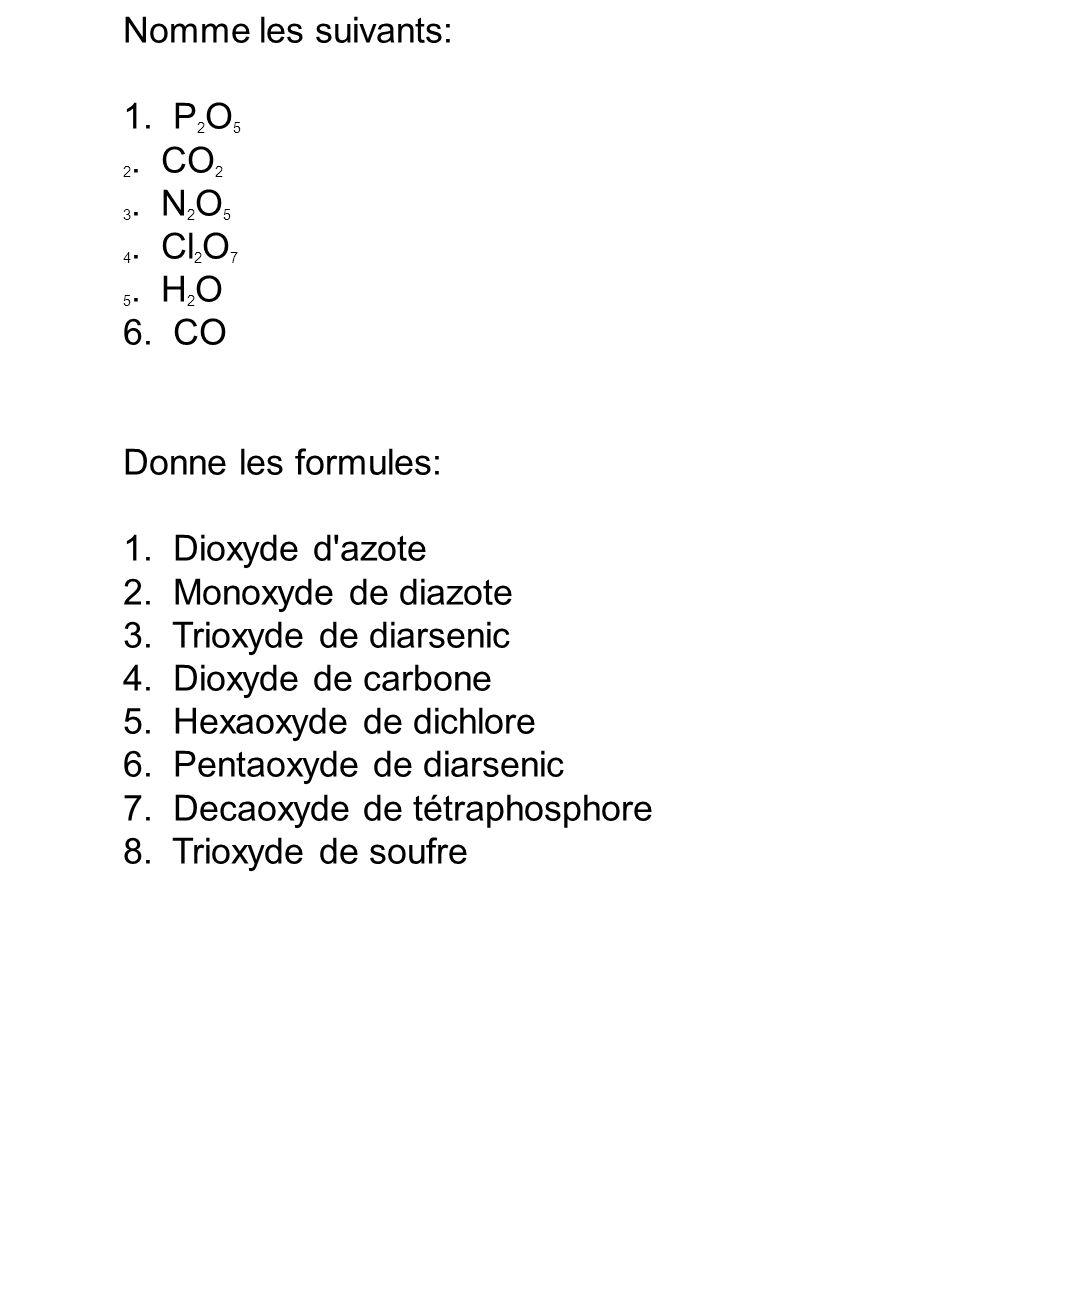 Nomme les suivants: 1. P 2 O 5 2. CO 2 3. N 2 O 5 4. Cl 2 O 7 5. H 2 O 6. CO Donne les formules: 1. Dioxyde d'azote 2. Monoxyde de diazote 3. Trioxyde